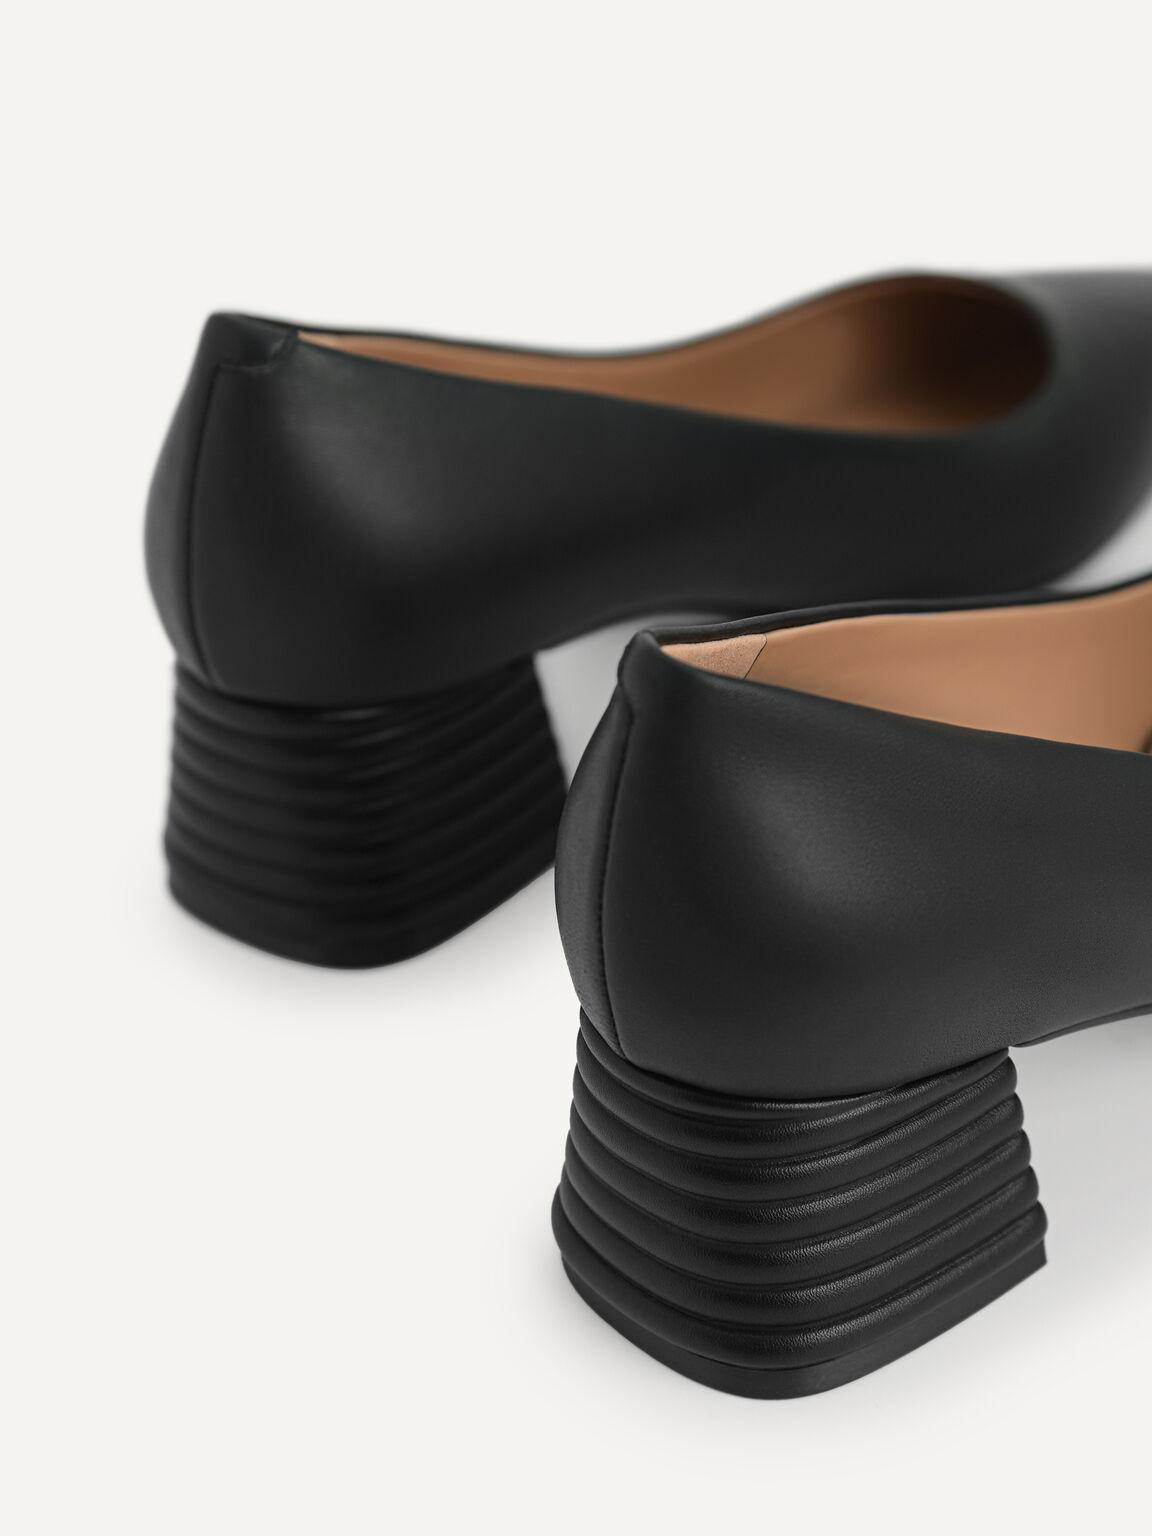 Square Toe Leather Pumps, Black, hi-res